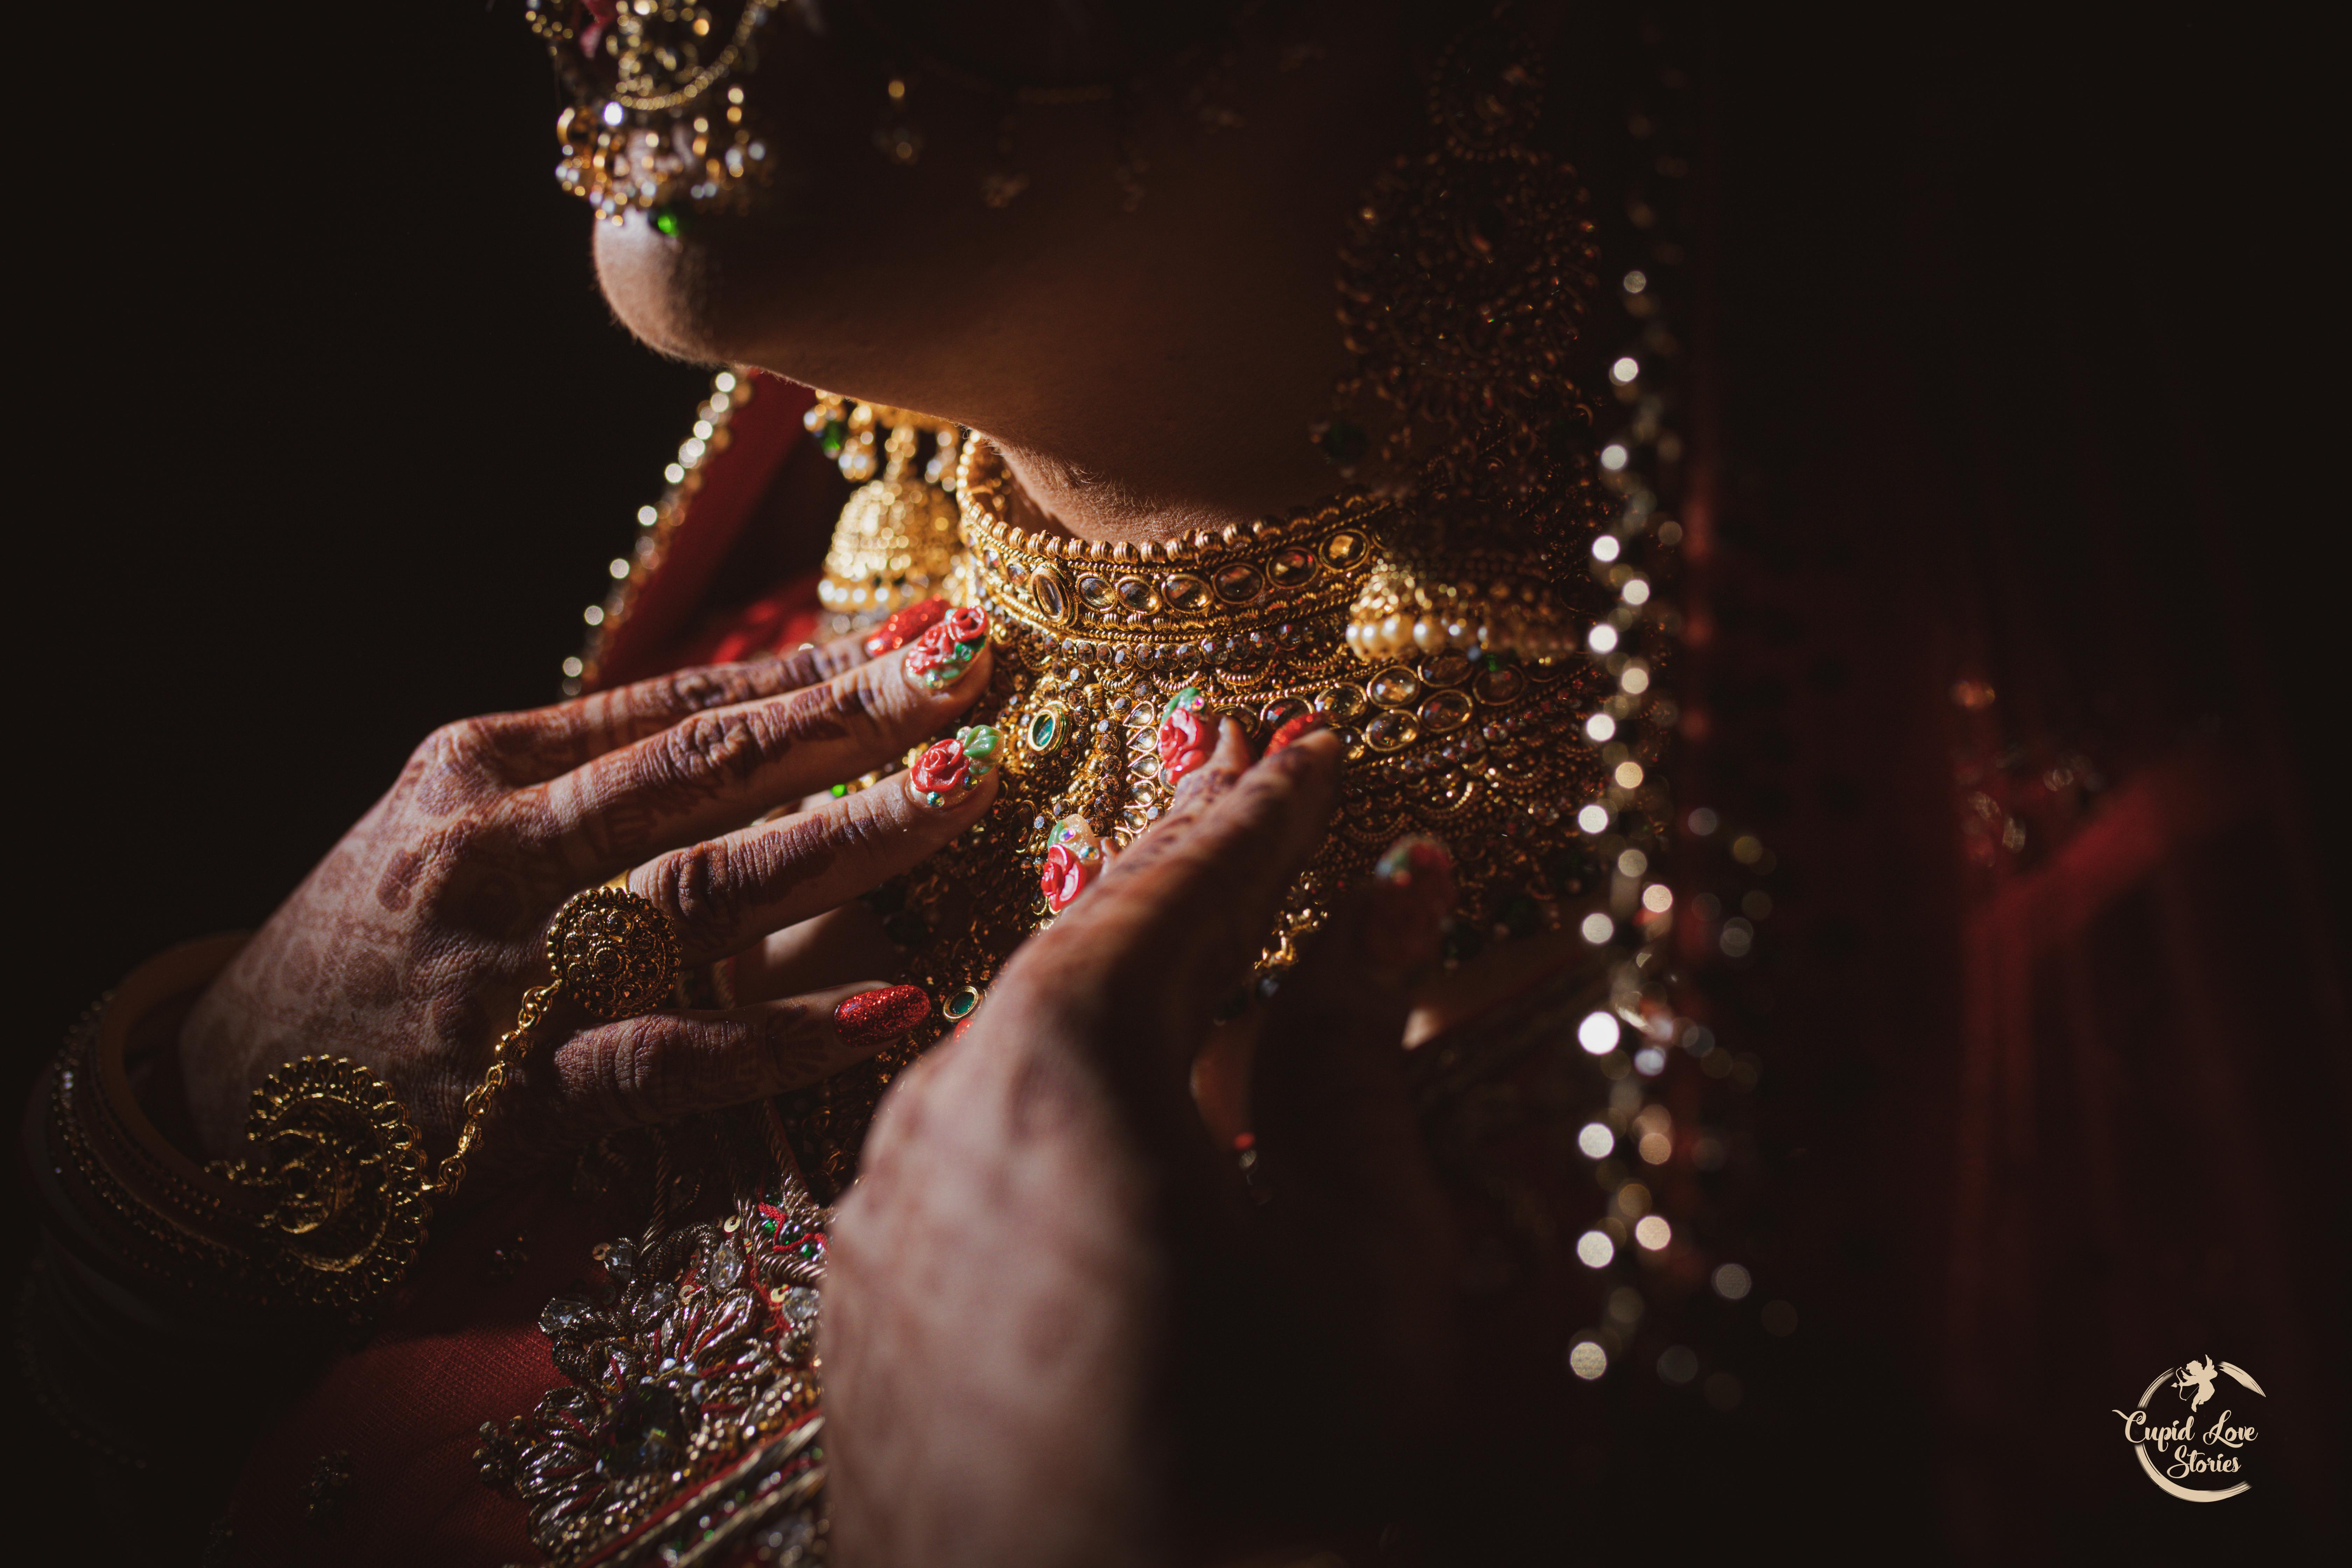 Aesthetic photo of bridal jewelry